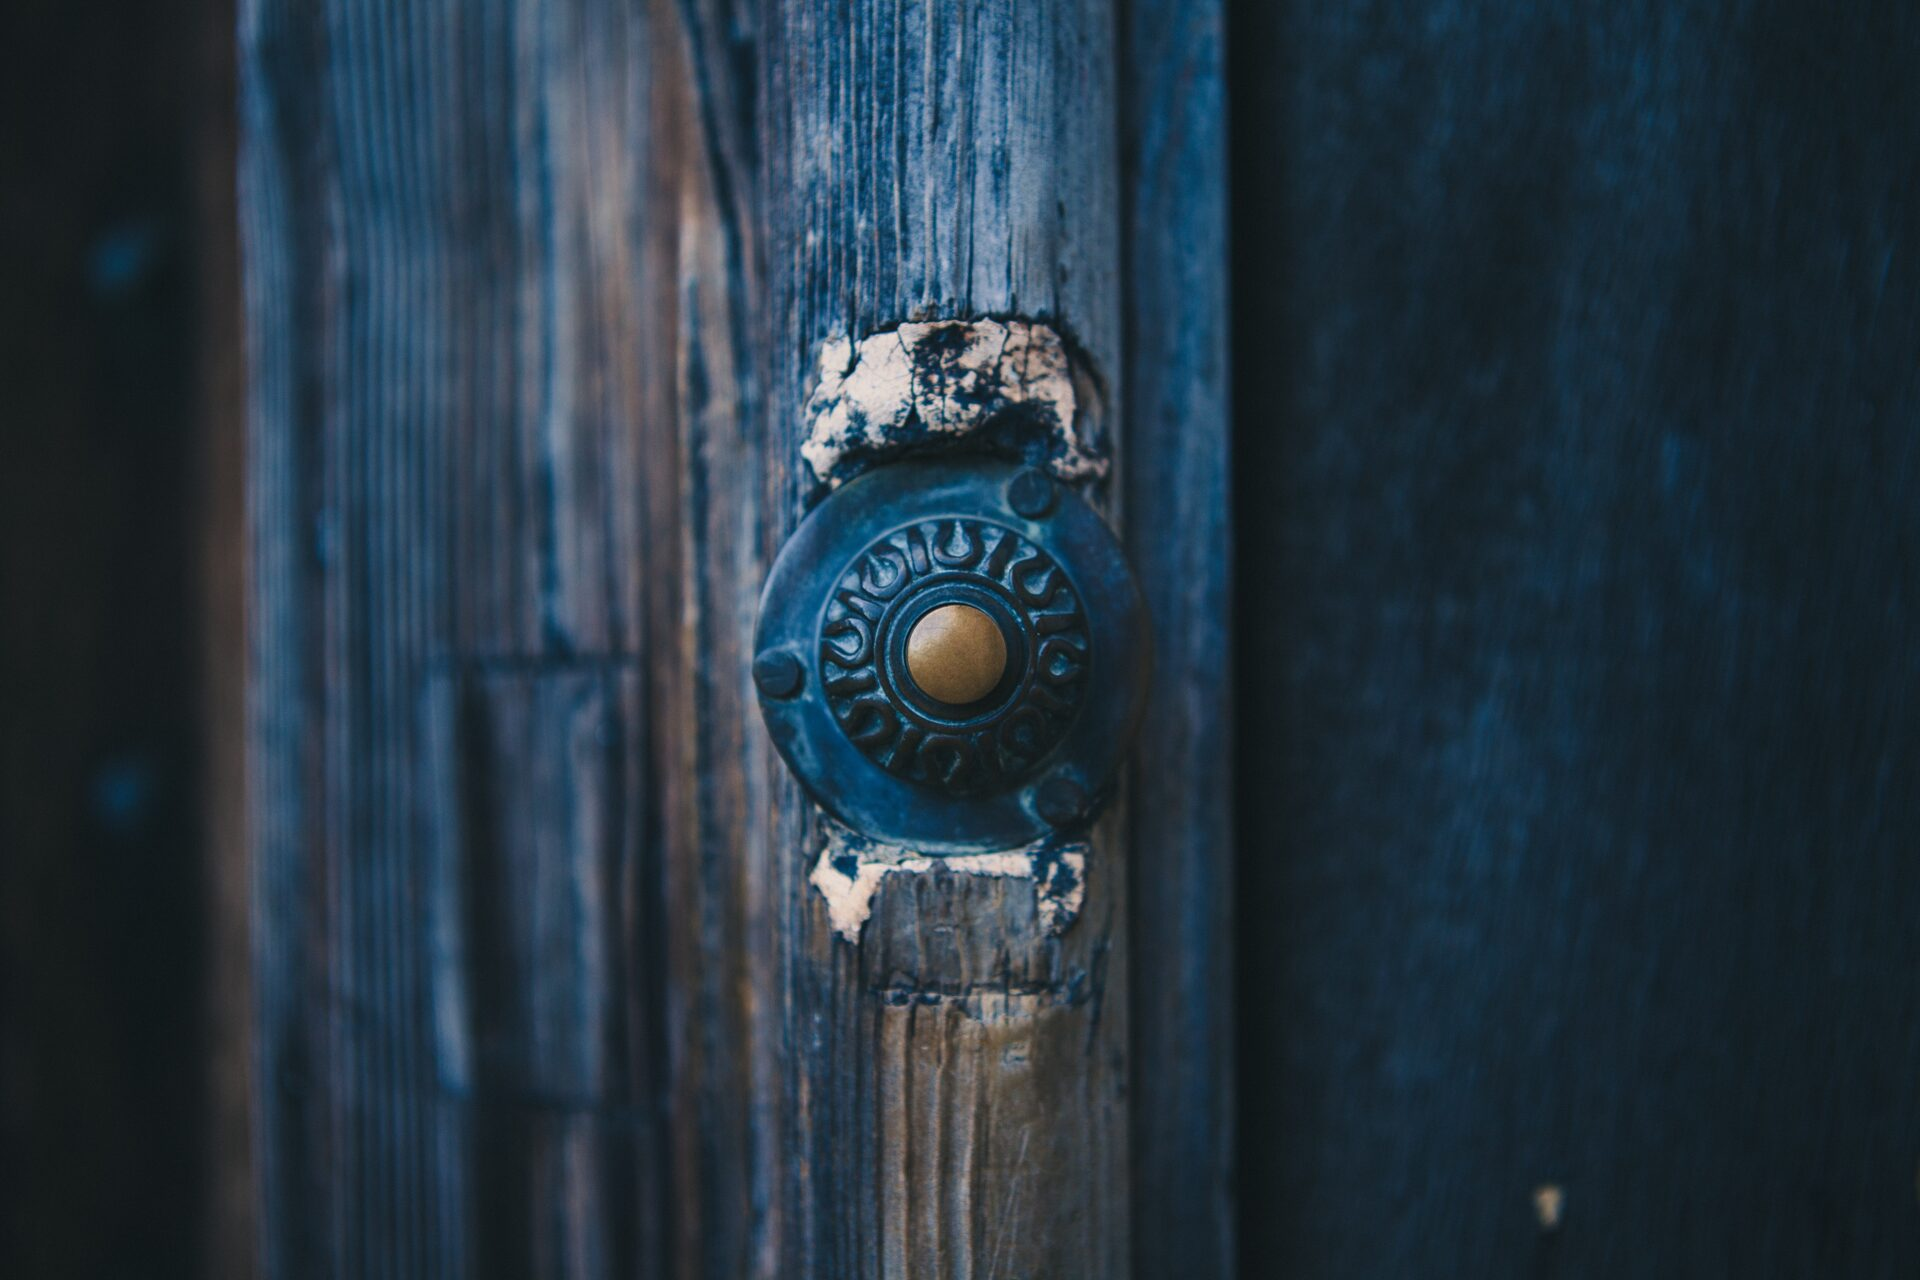 Diy Smart Doorbell For Just 2 No Soldering Required Frenck Dev